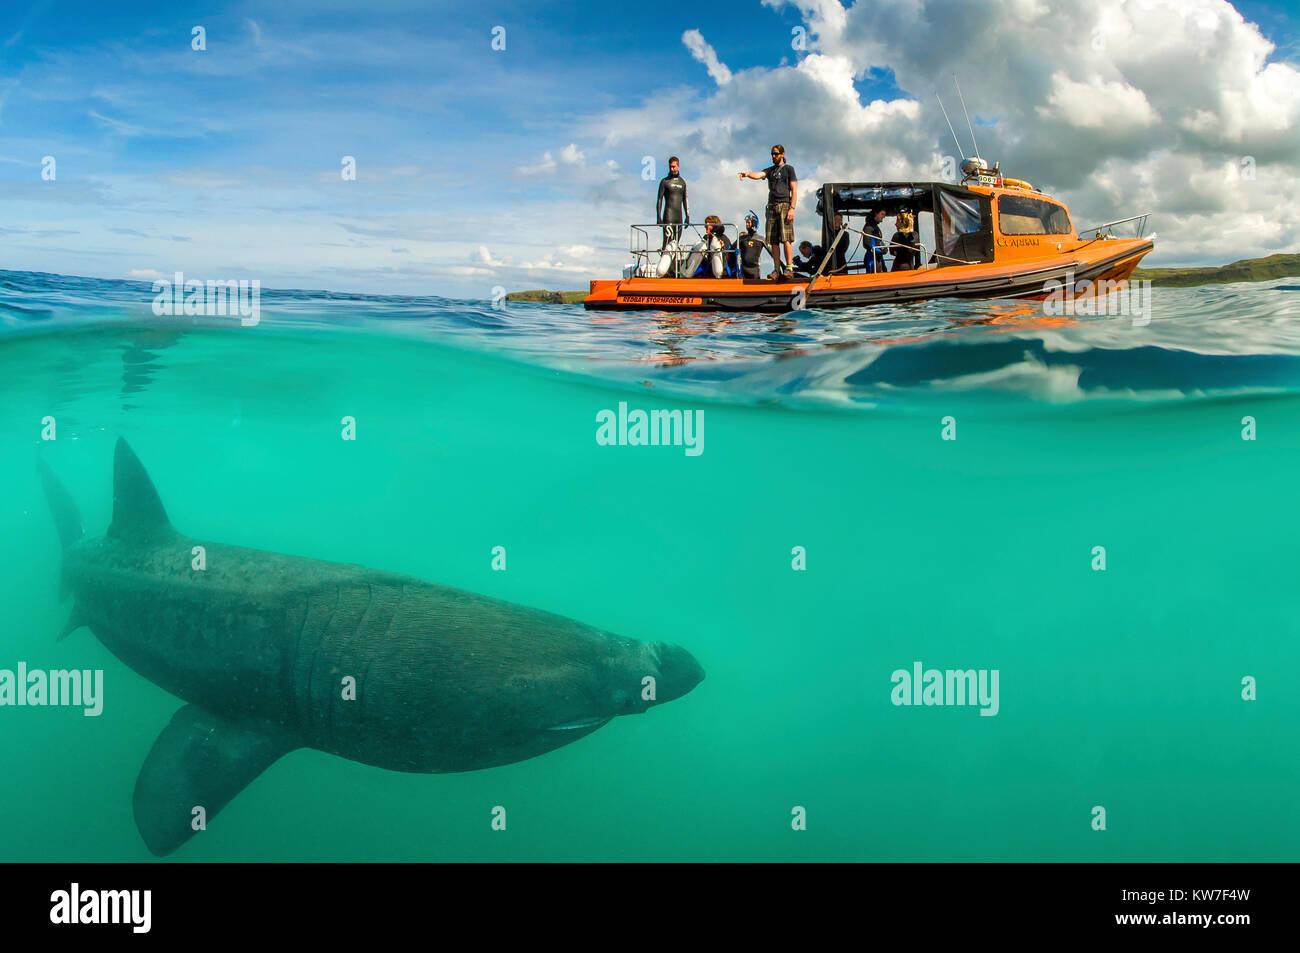 Basking Shark Encounter - Stock Image